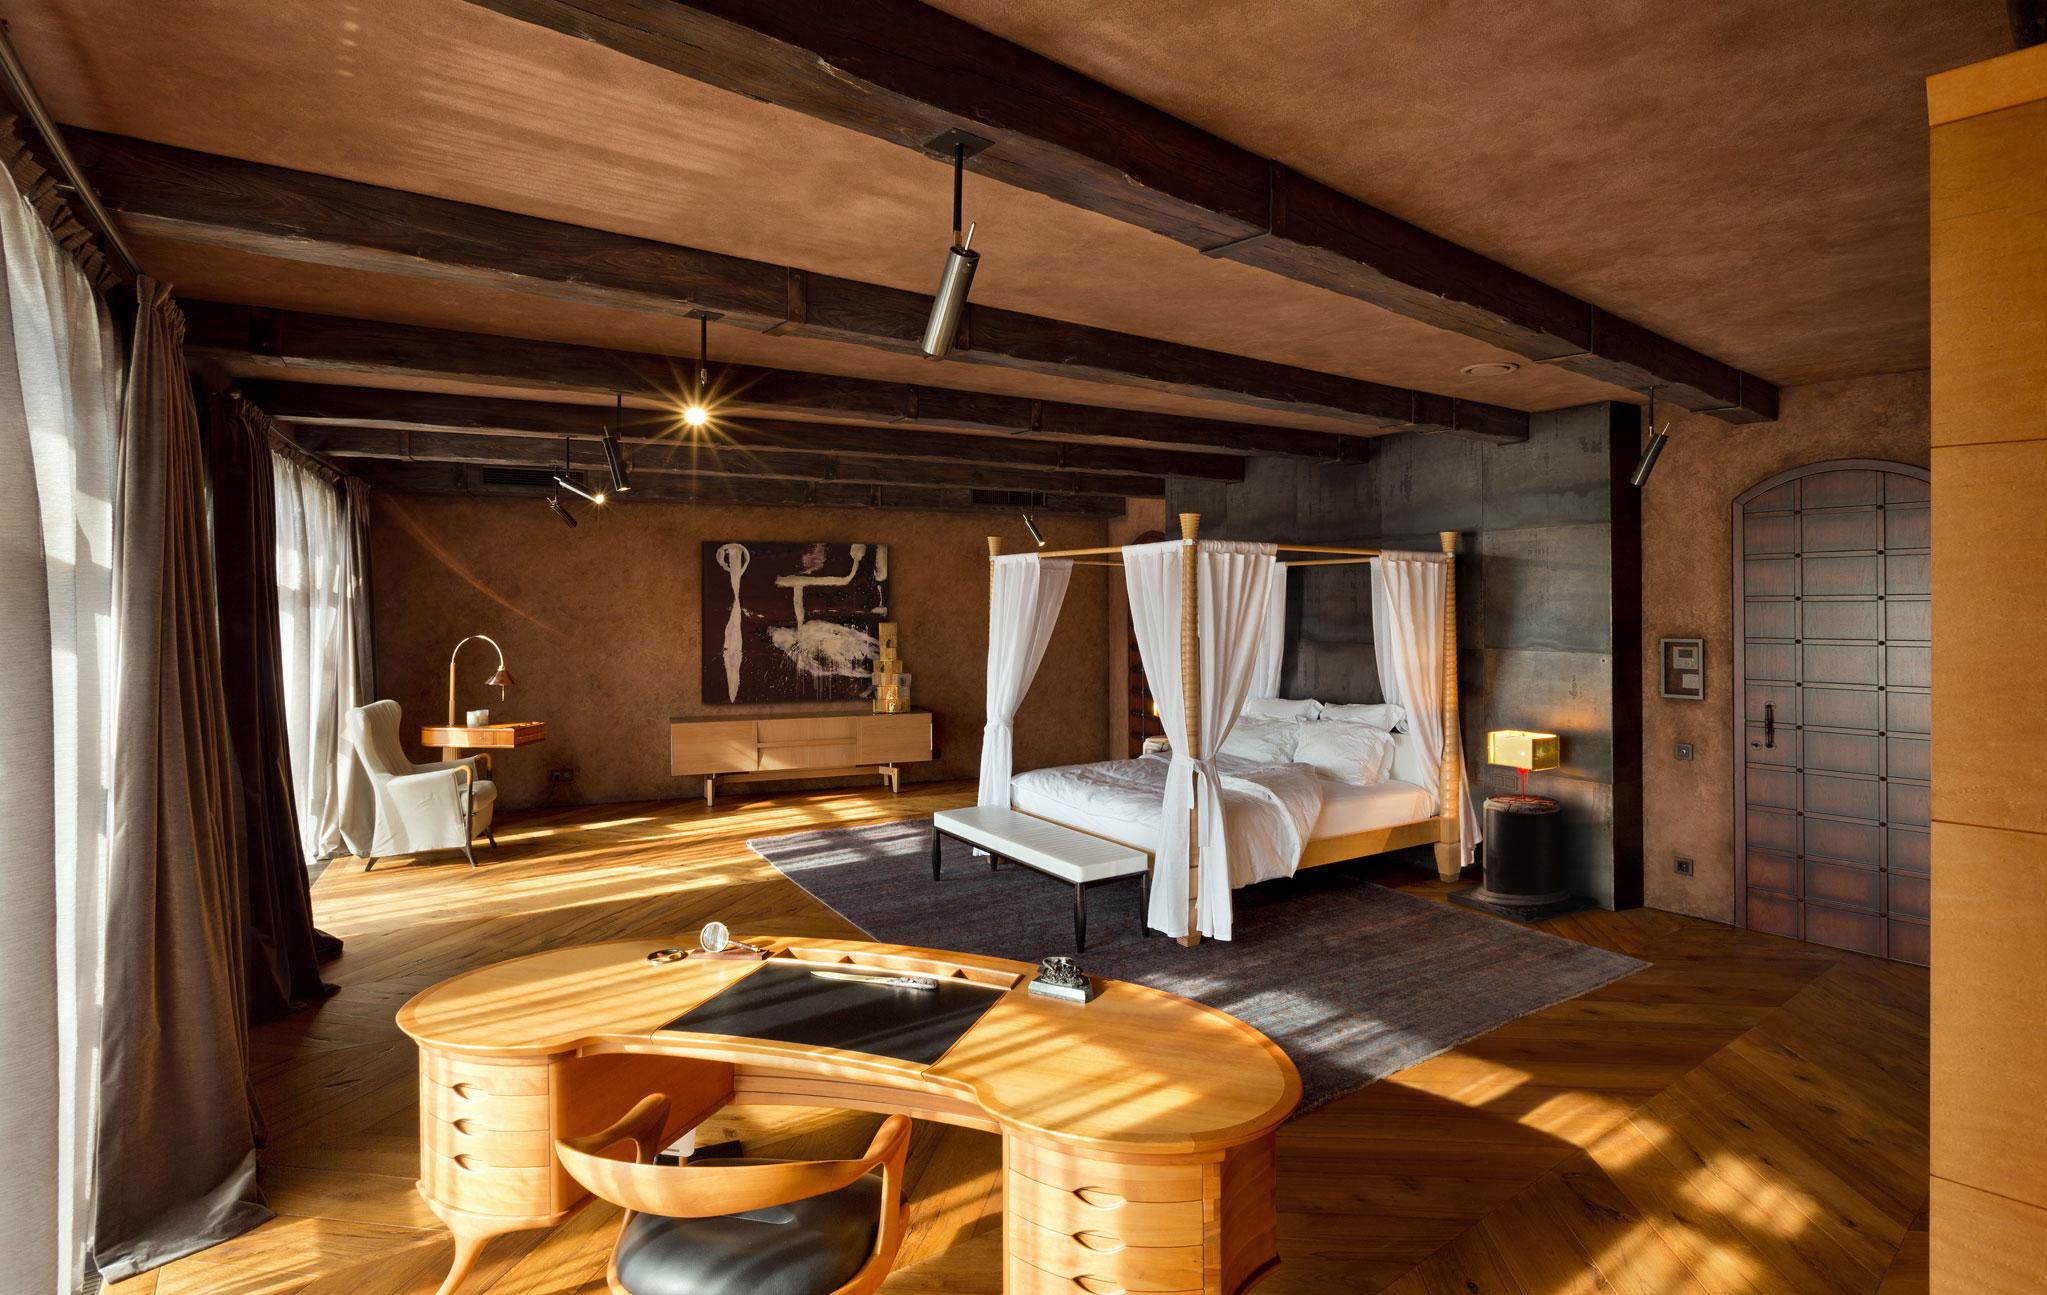 Italian Region Toscana Theme of BO Home near Kiev by Baraban+ design studio-10